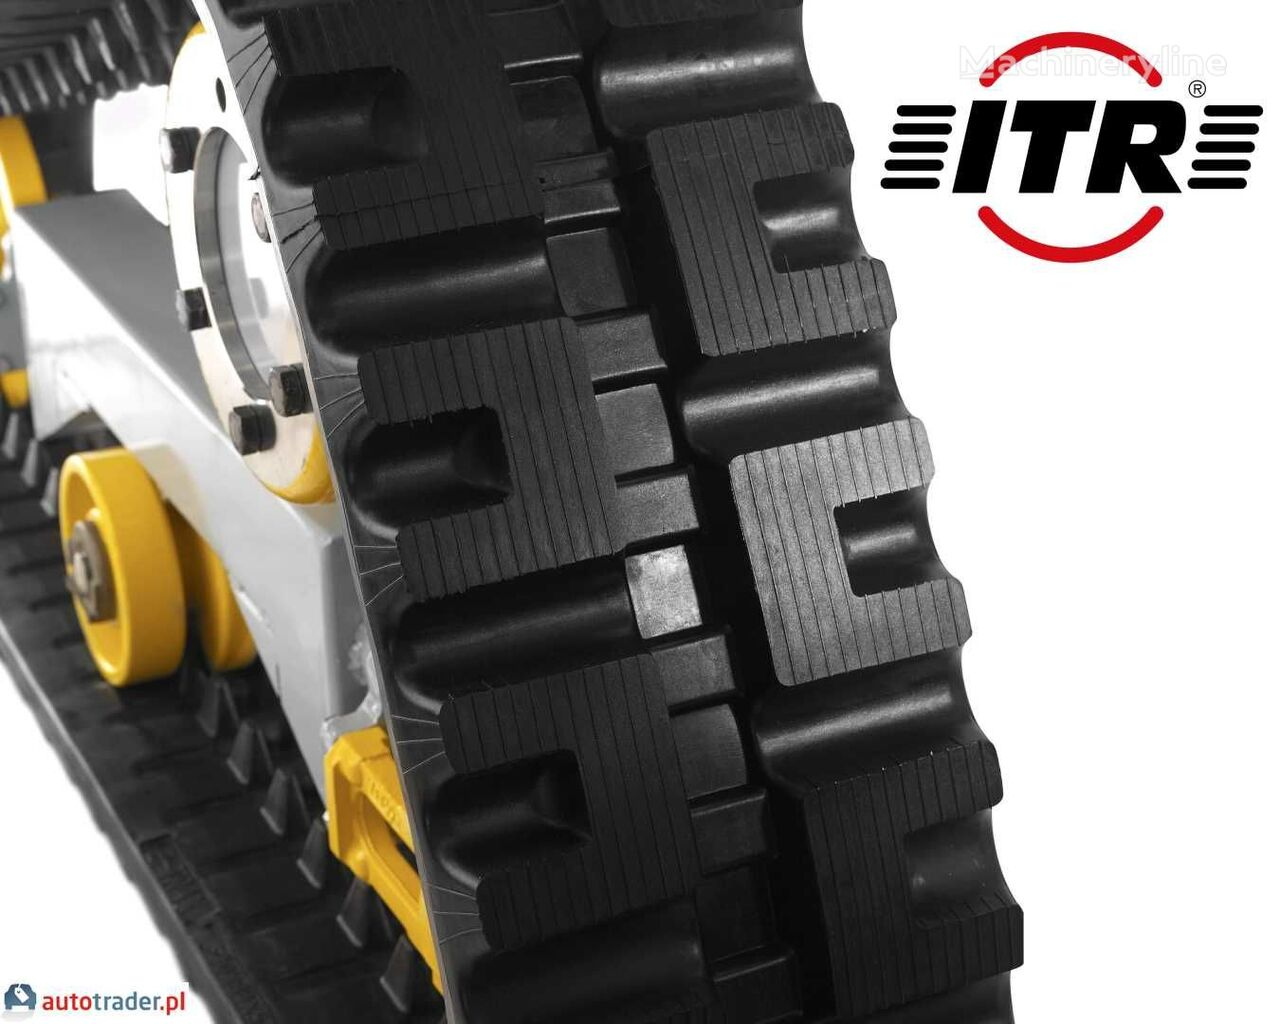 lagarta para ITR PEL JOB LS406 2016r ITR mini-escavadora